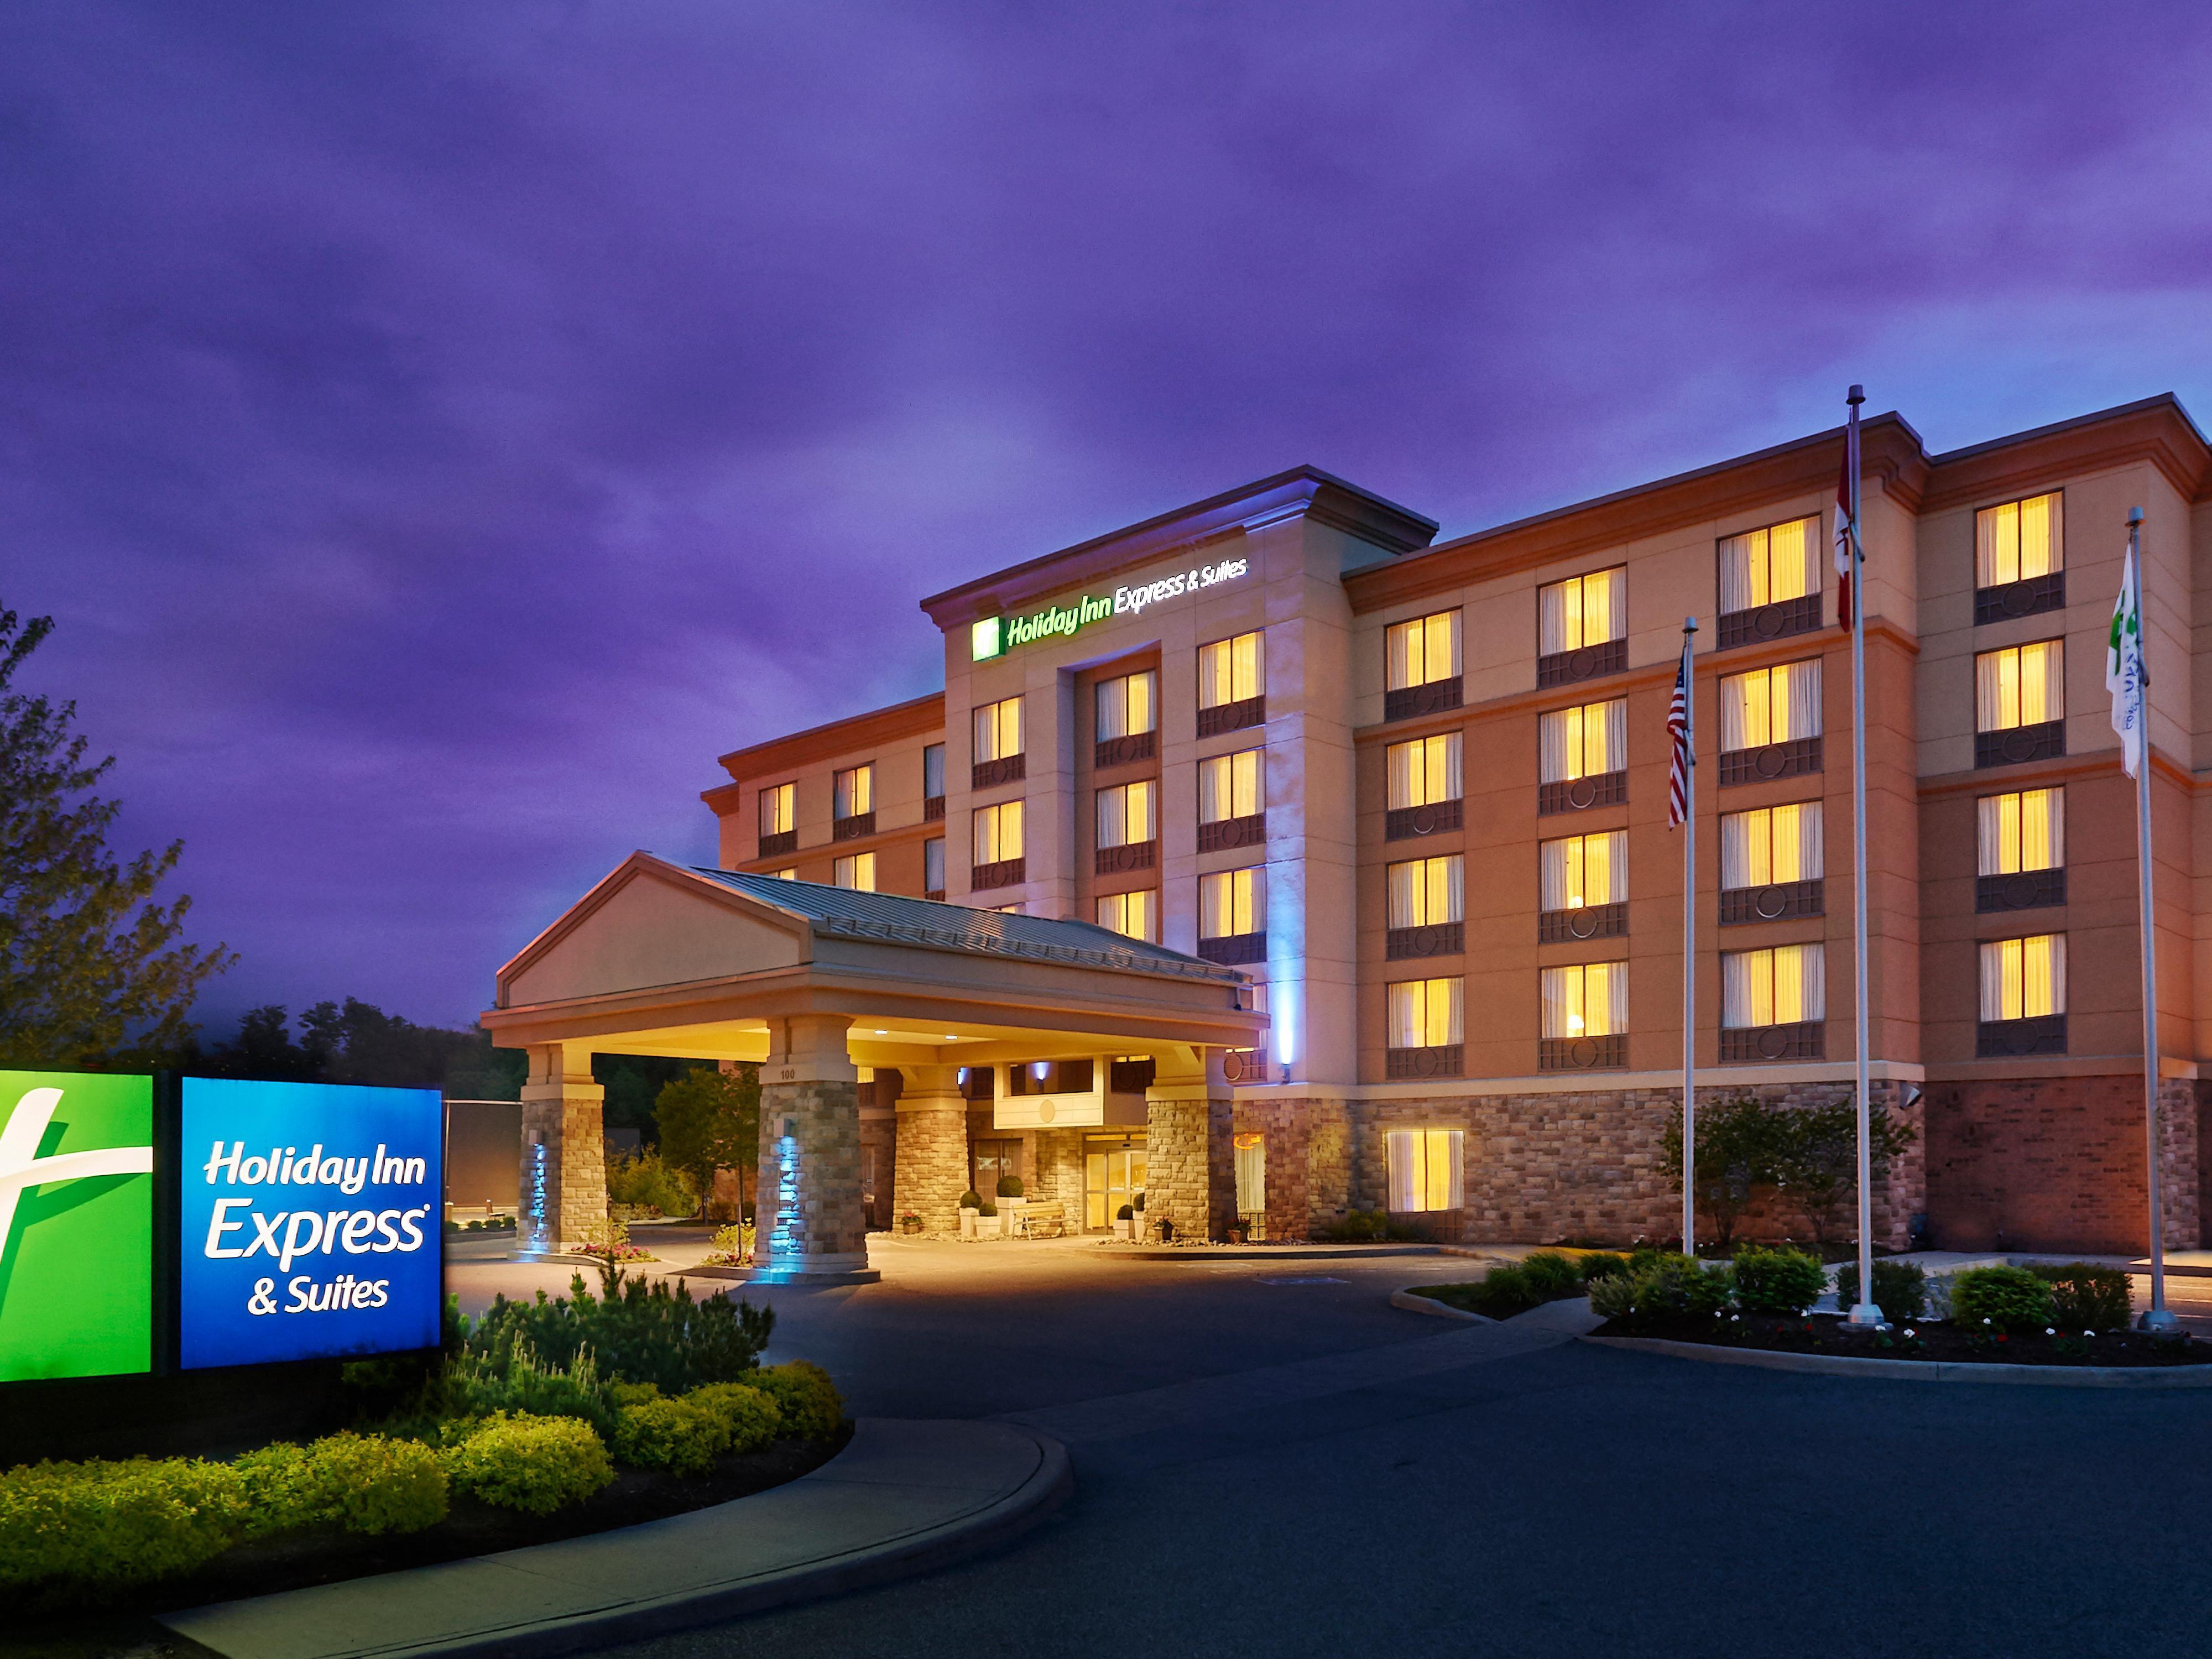 Holiday Inn Express Suites Huntsville Muskoka Hotel In By Ihg